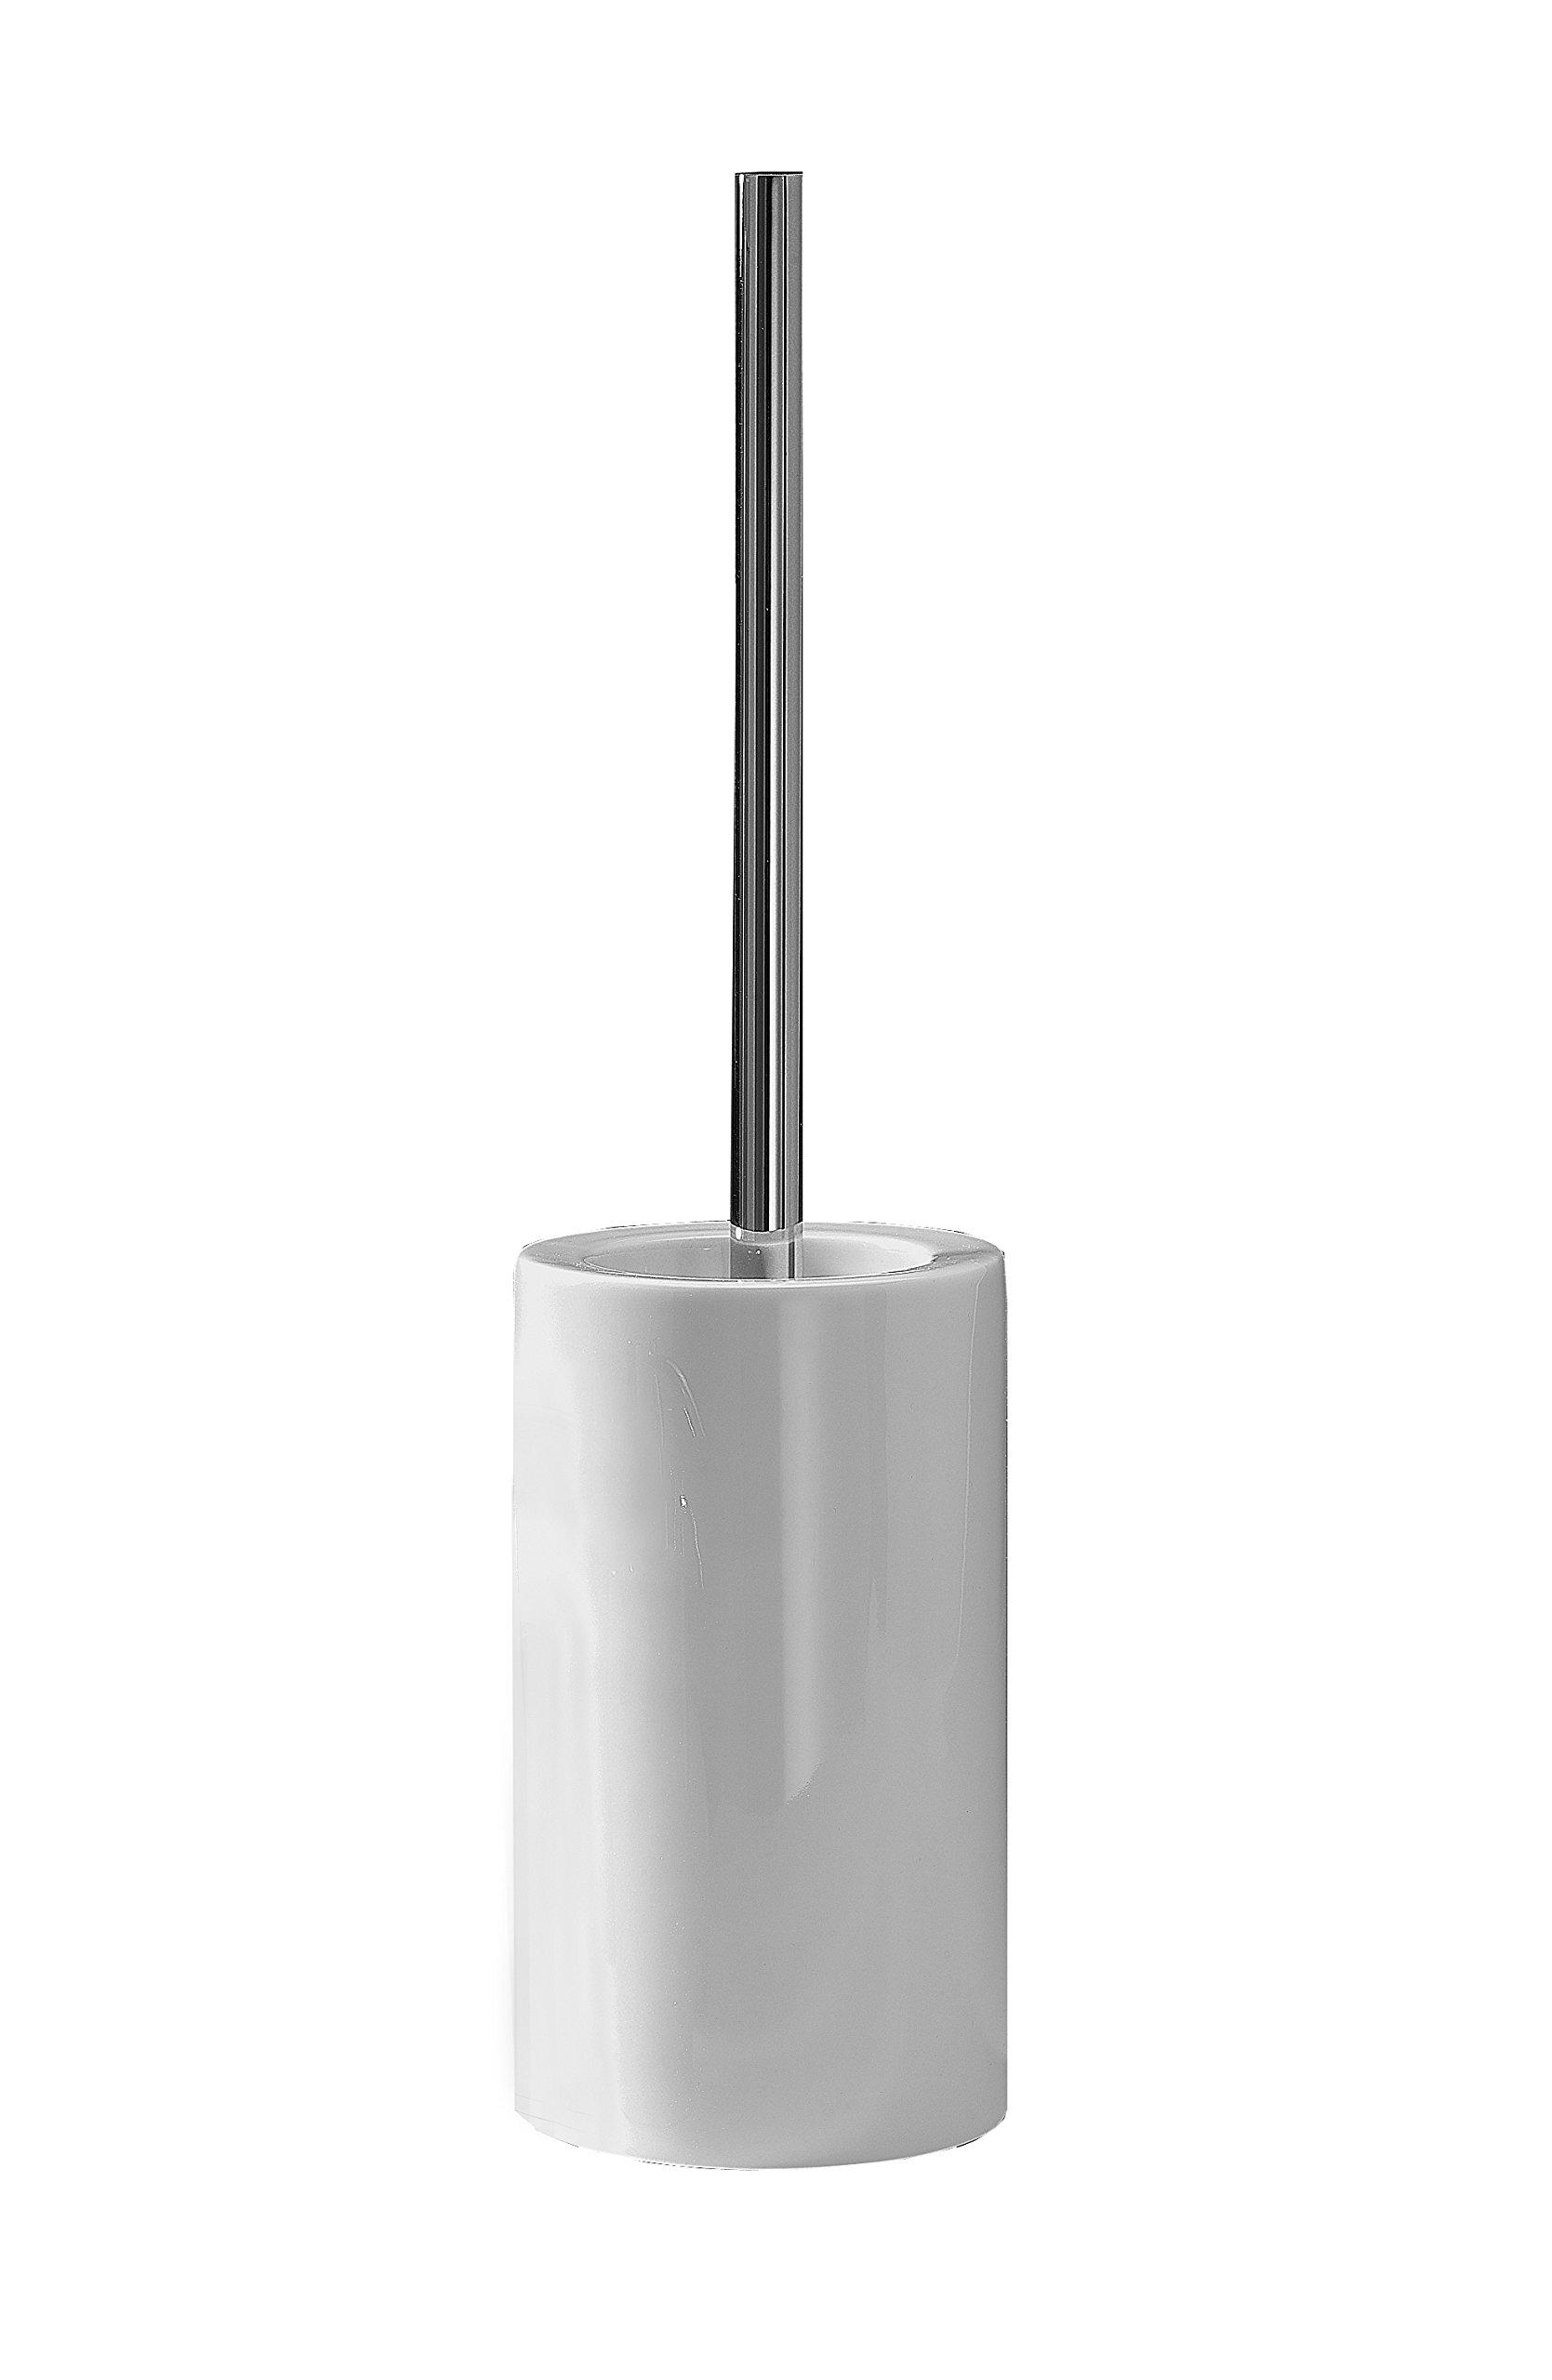 DWBA Free Standing Toilet Bowl Brush and Holder Set. Porcelain Bowl for Toilet Brush and Holder Cleaner (Round Bowl, Polished Chrome)